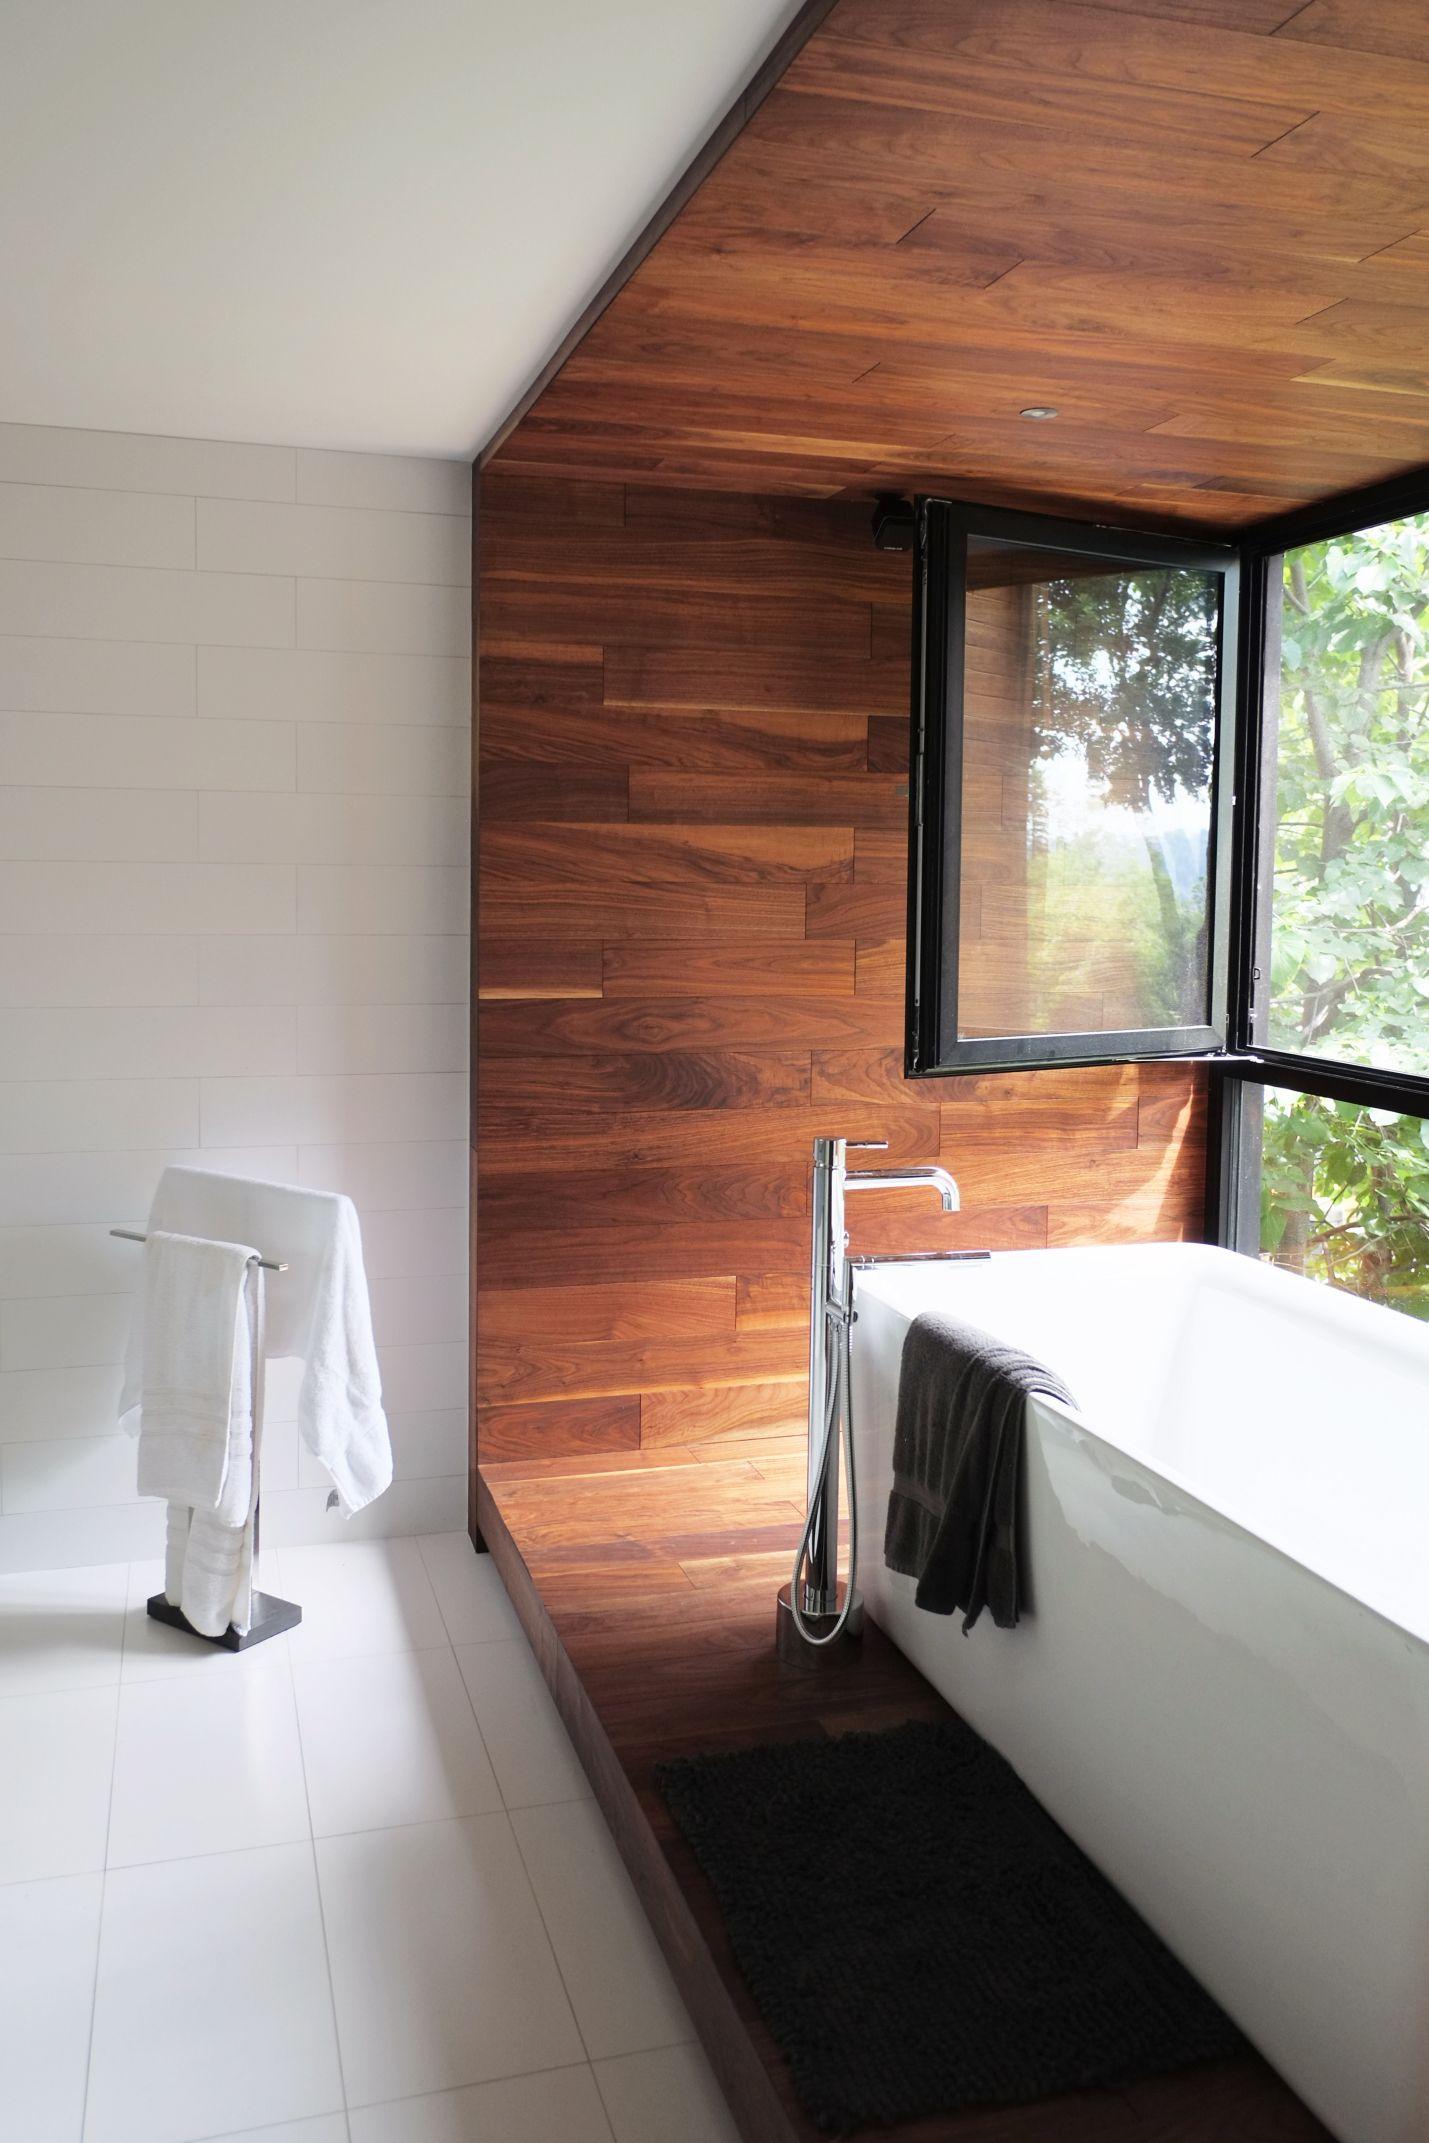 Résidence rue de luAnse  Cabin Interiors and Bath